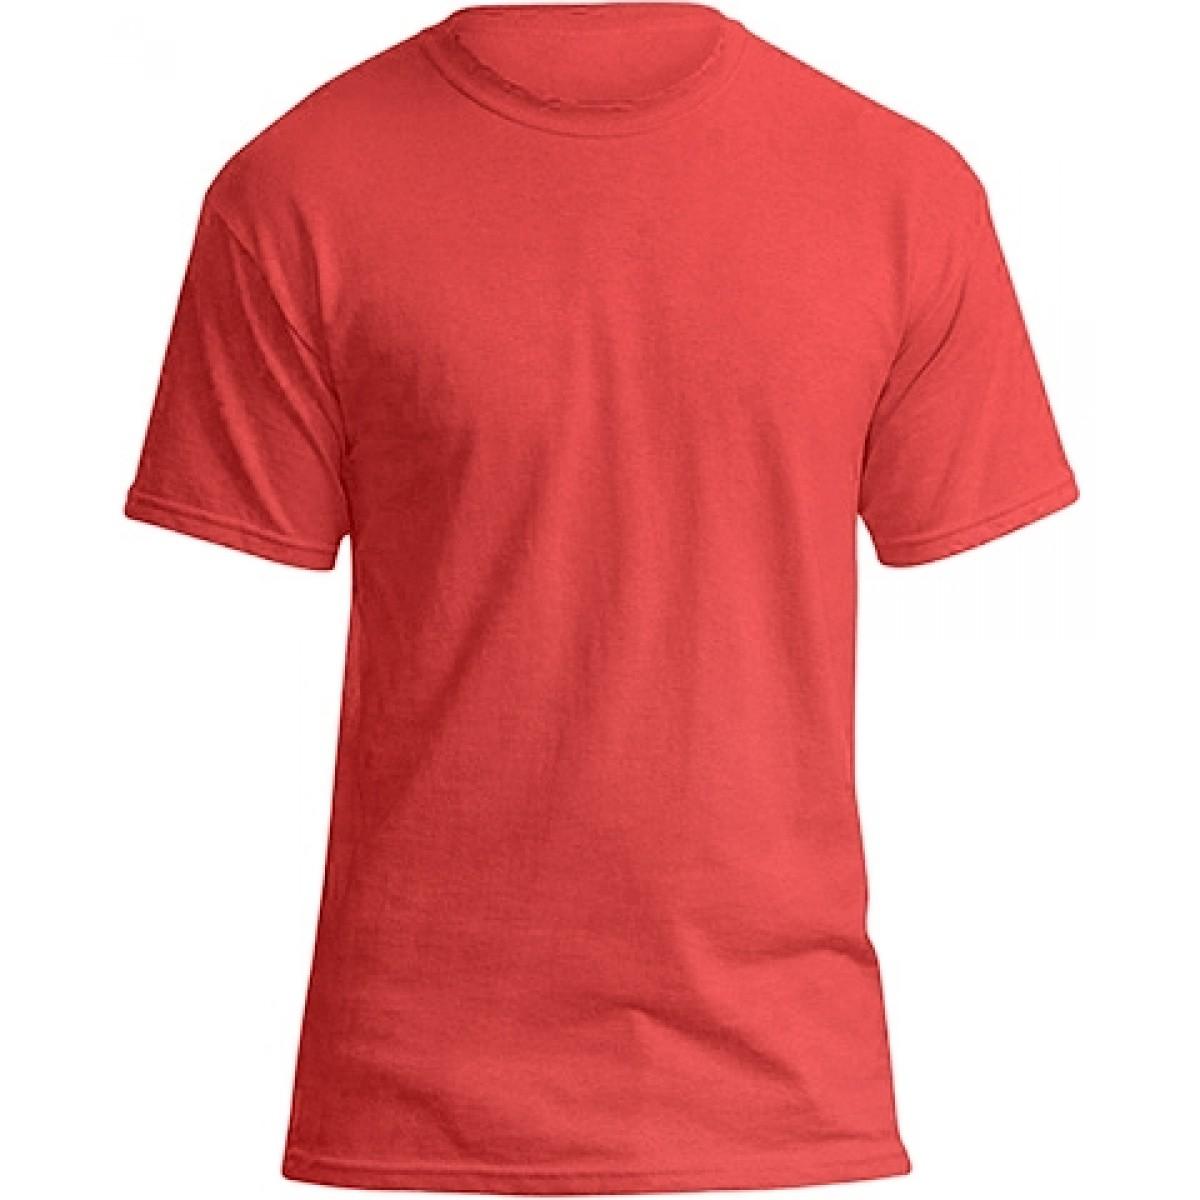 Soft 100% Cotton T-Shirt-Heather Red-2XL